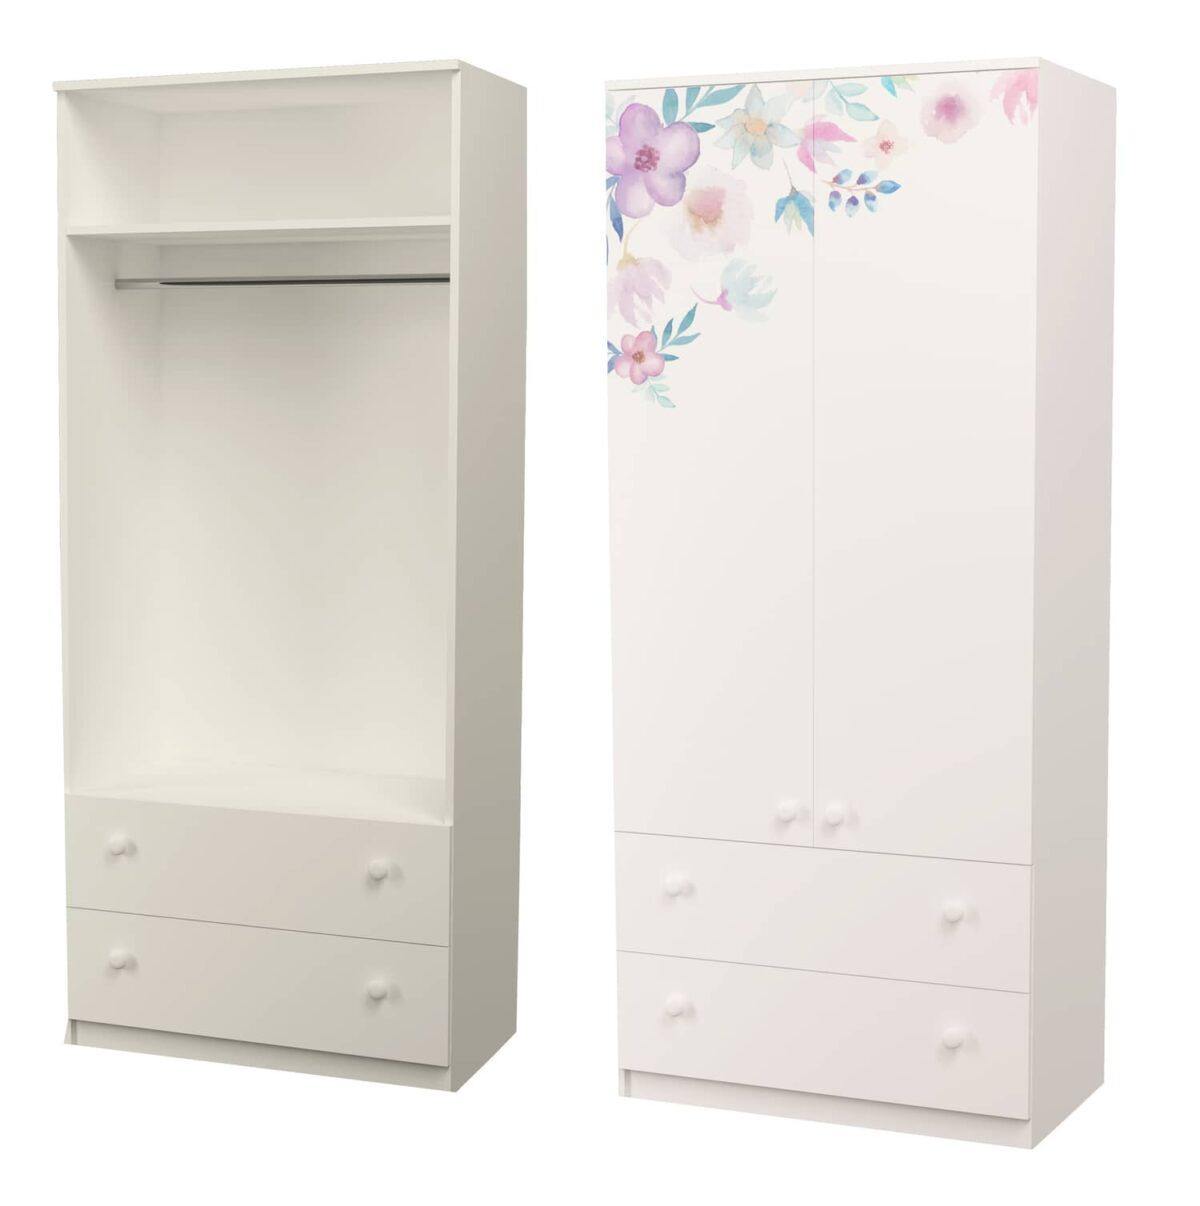 шкаф для вешалок цветы